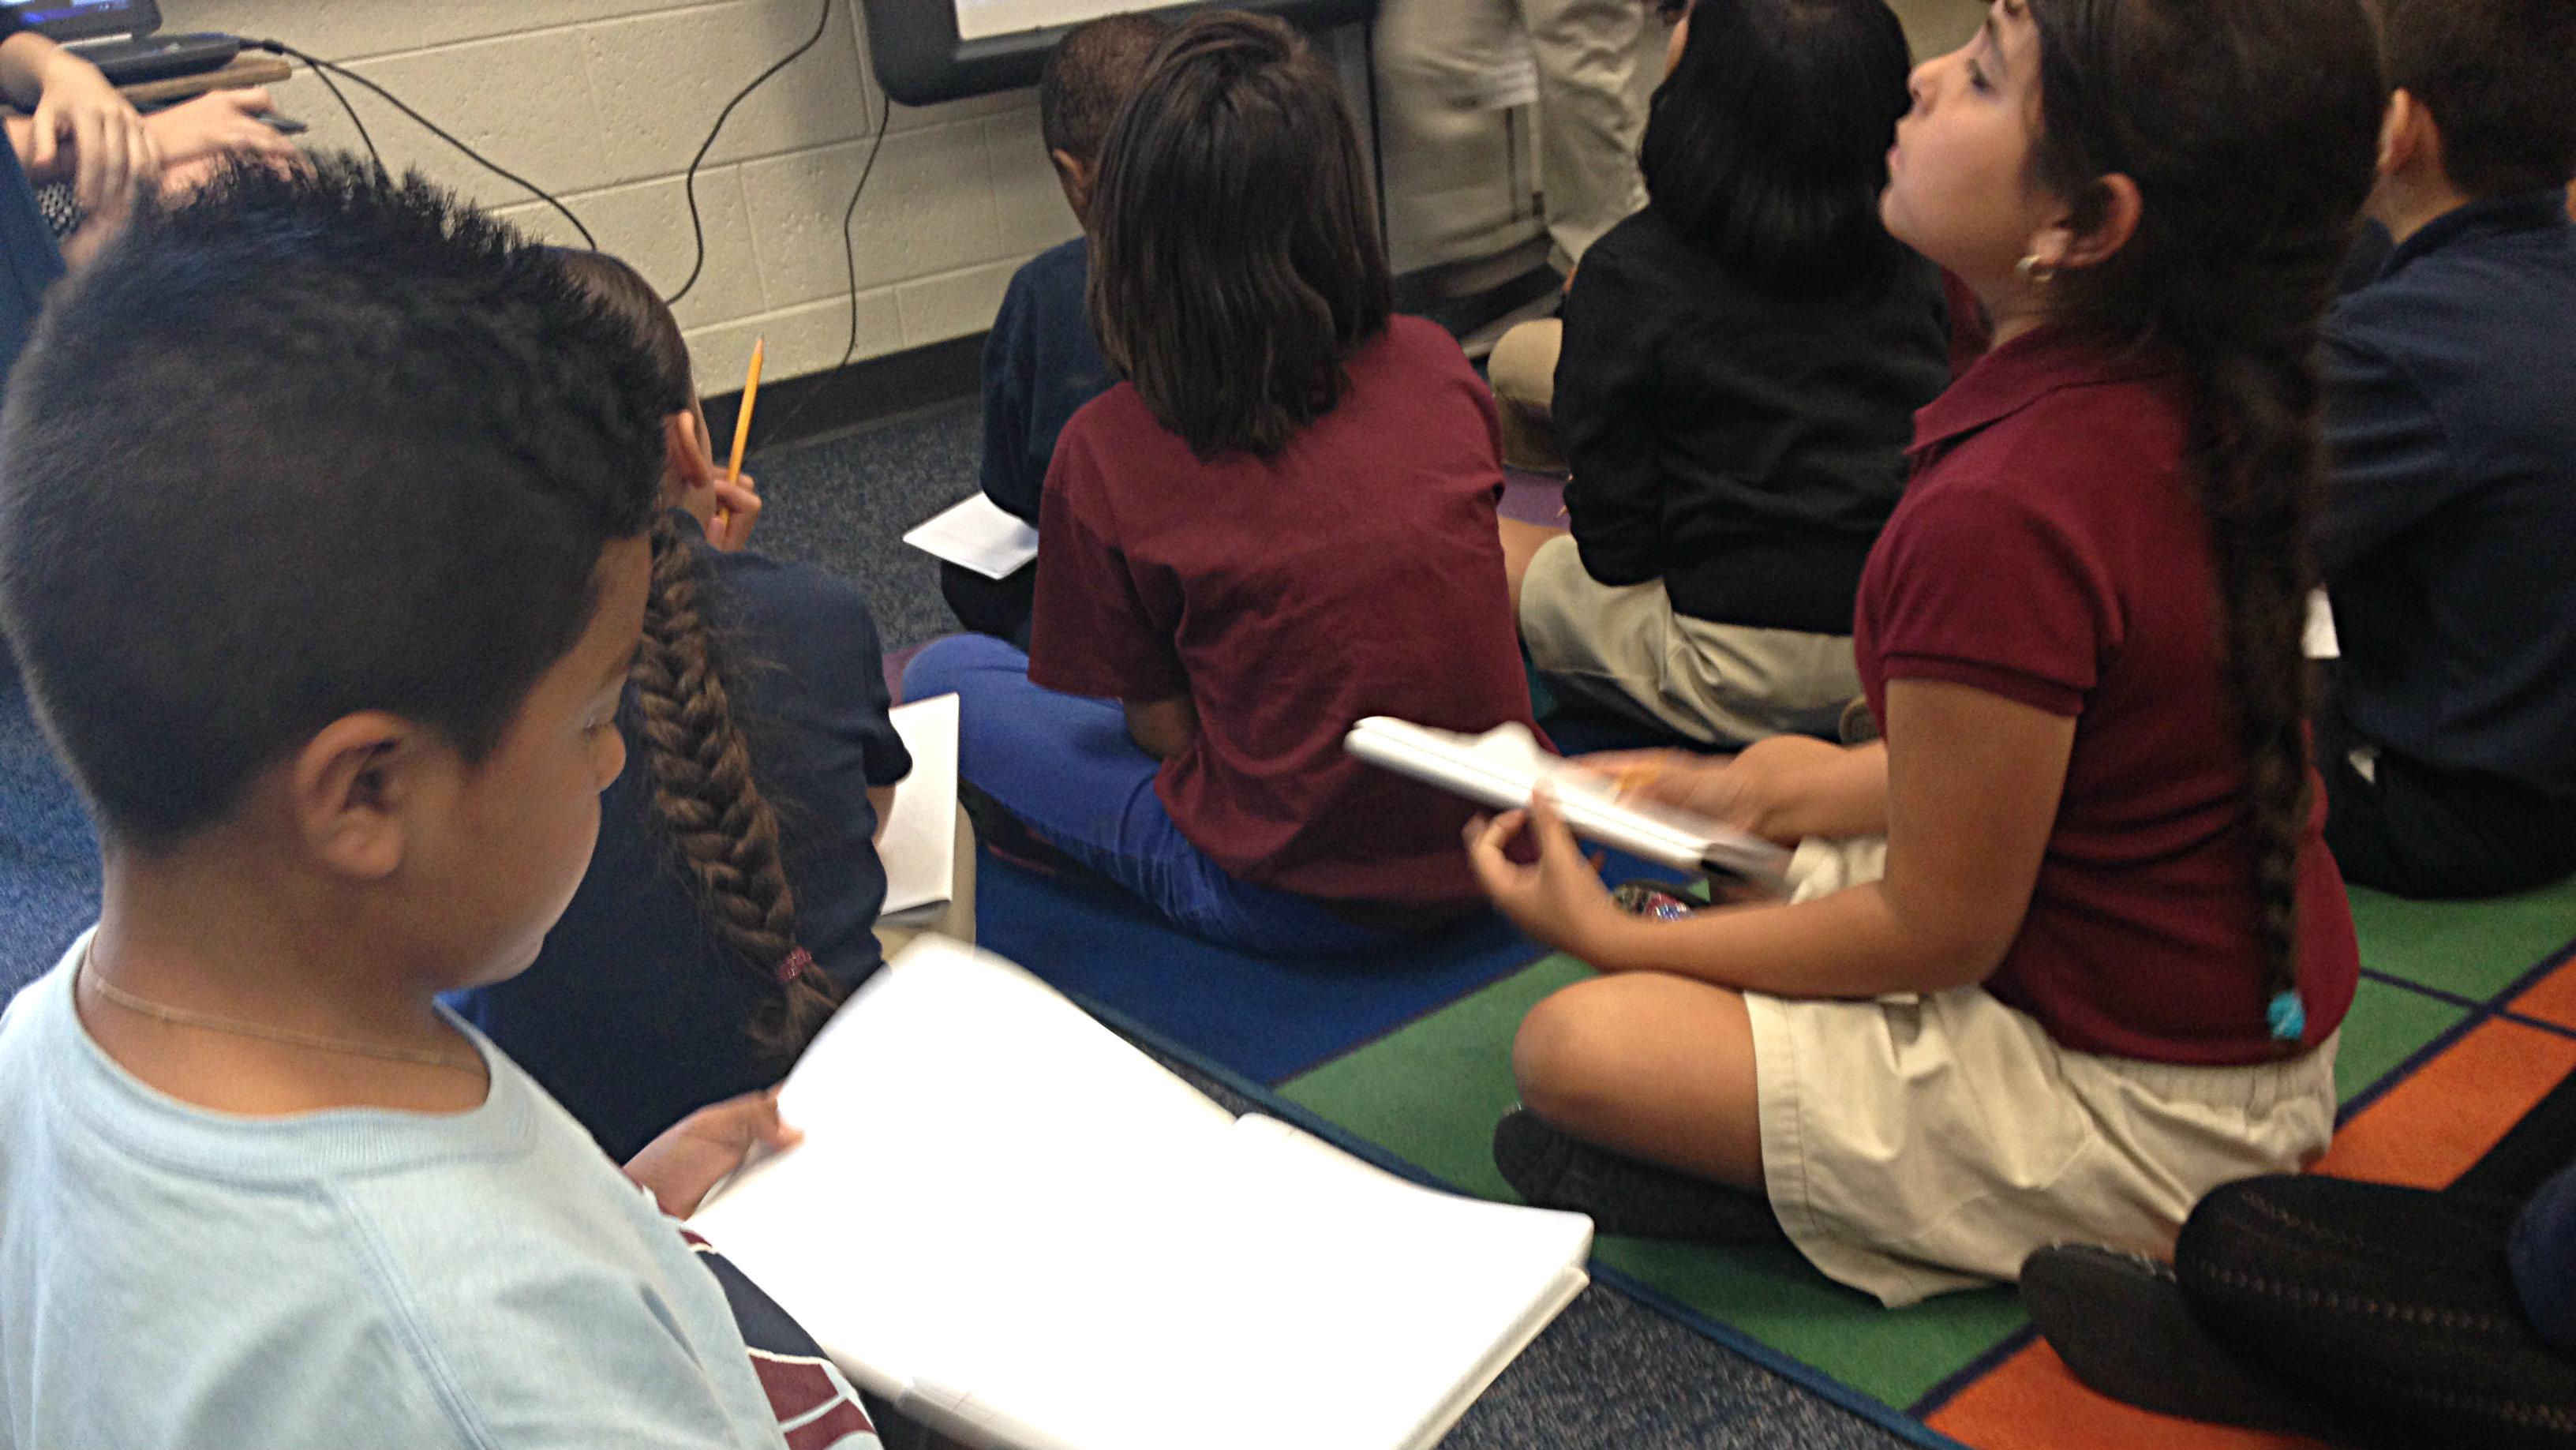 Photo: Classroom (McGlone Elementary, 4th grade)